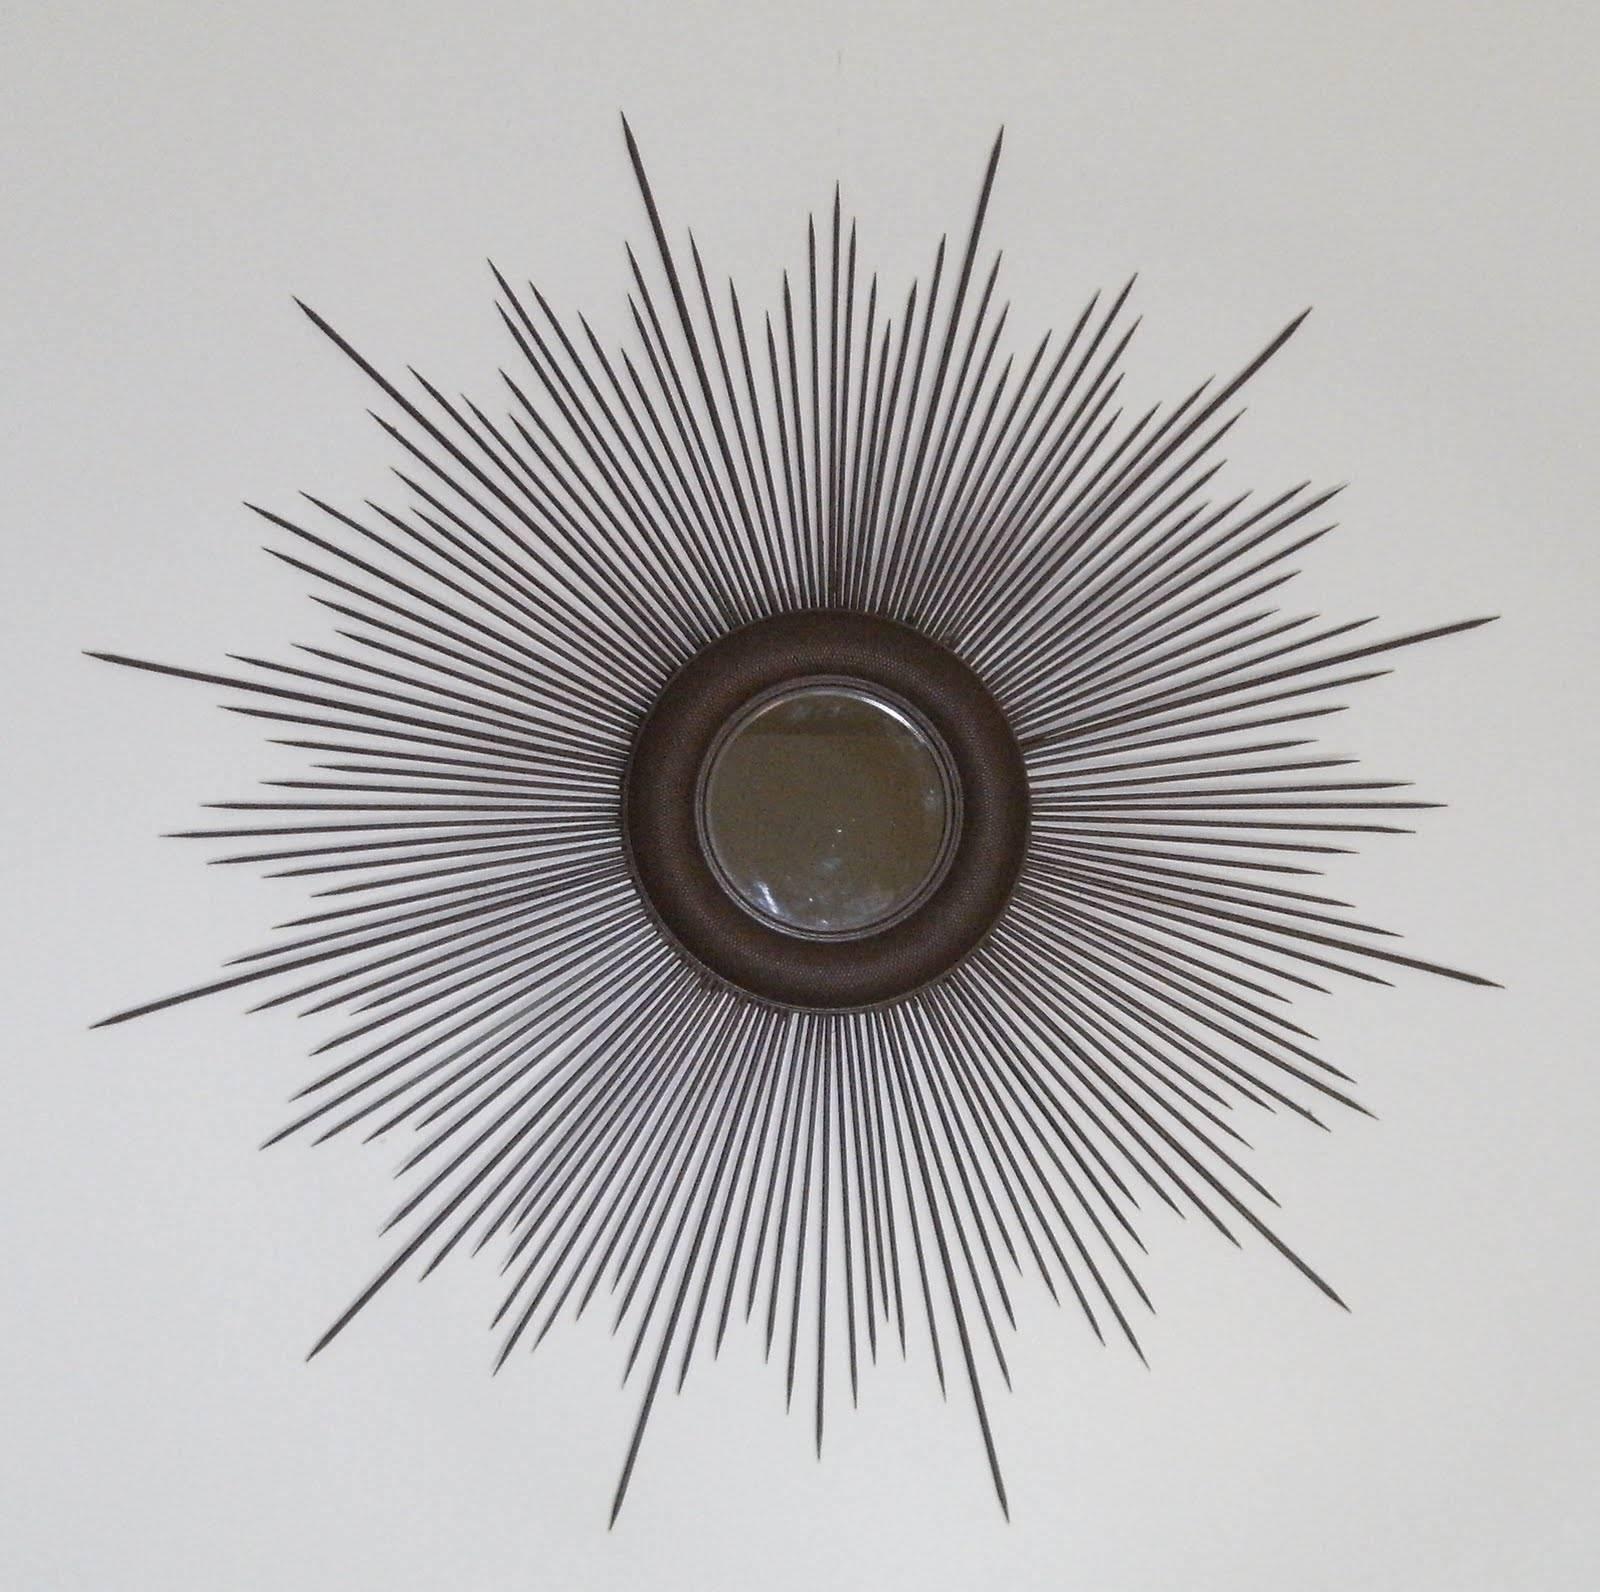 Potatoez N' Pineconez: Starburst Mirror For Bronze Starburst Mirrors (View 22 of 25)